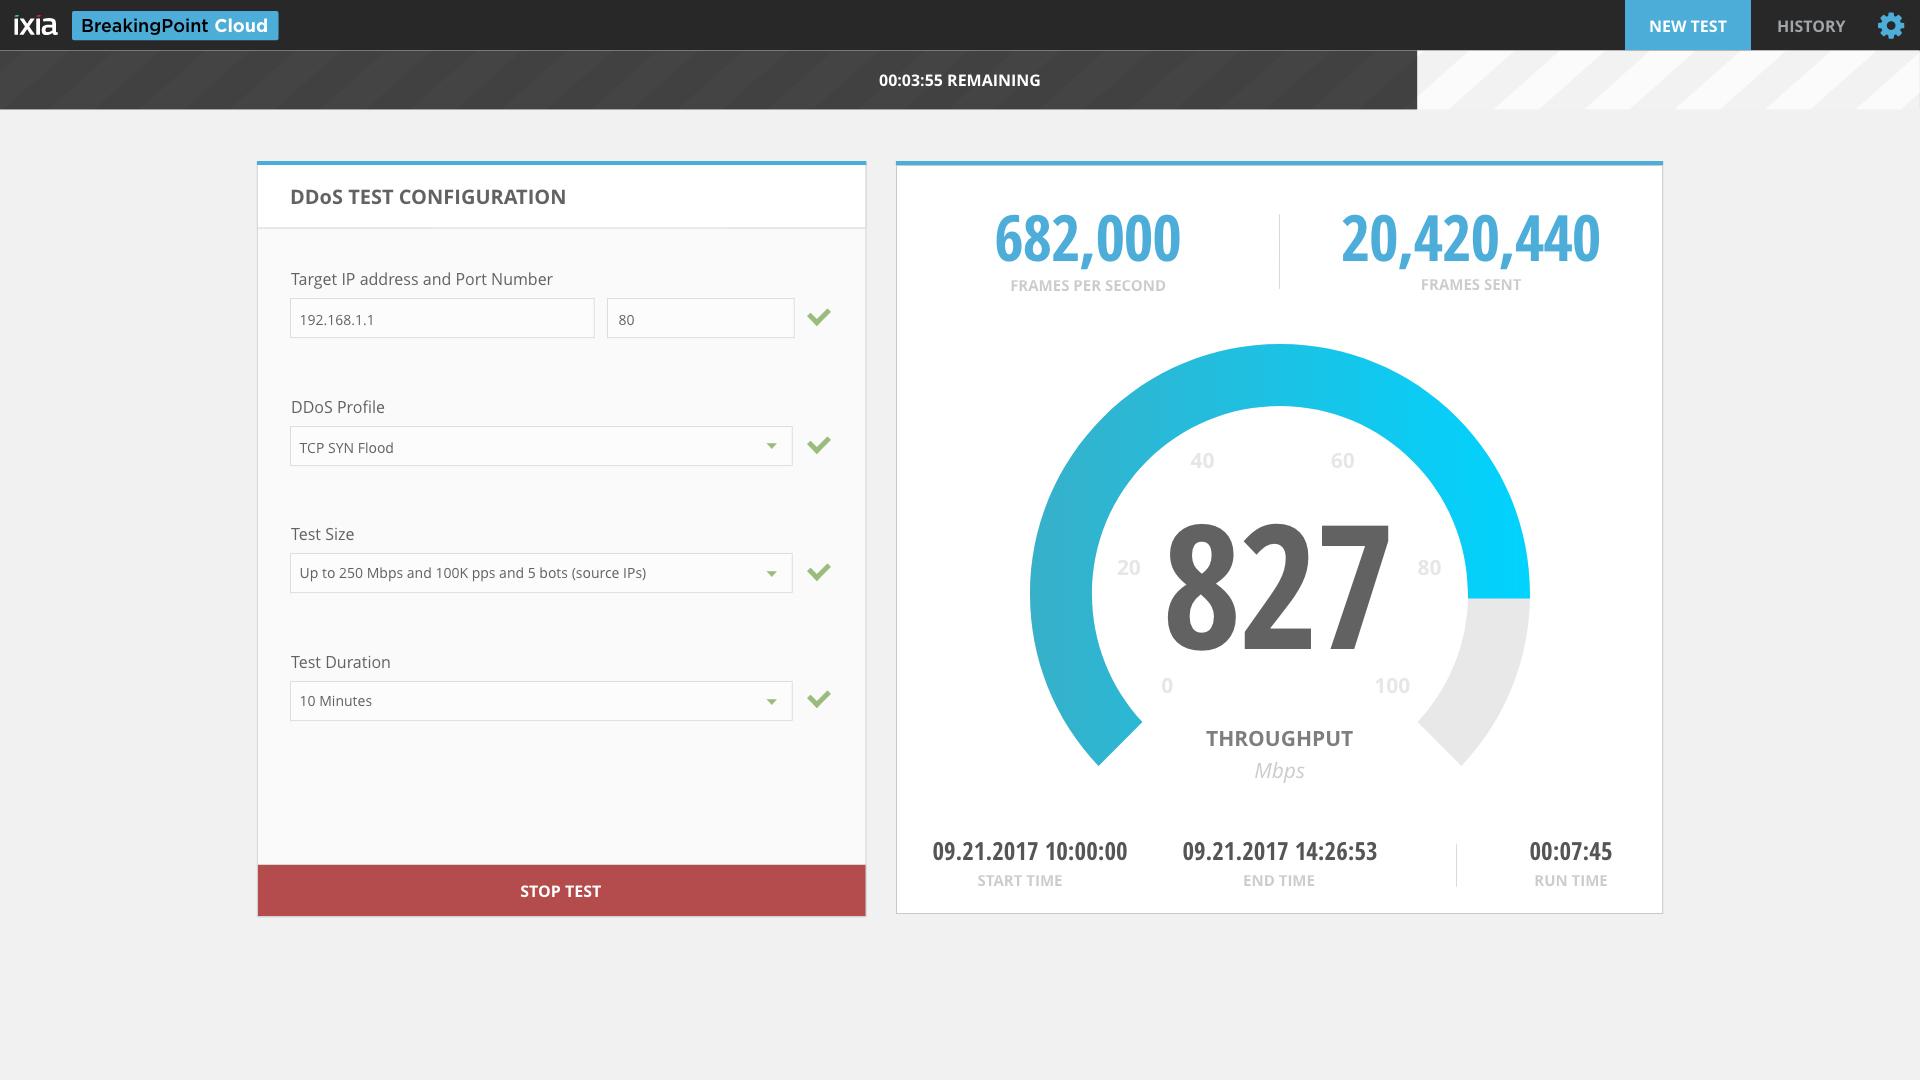 Ixia's BreakingPoint Cloud Helps Organizations Validate End